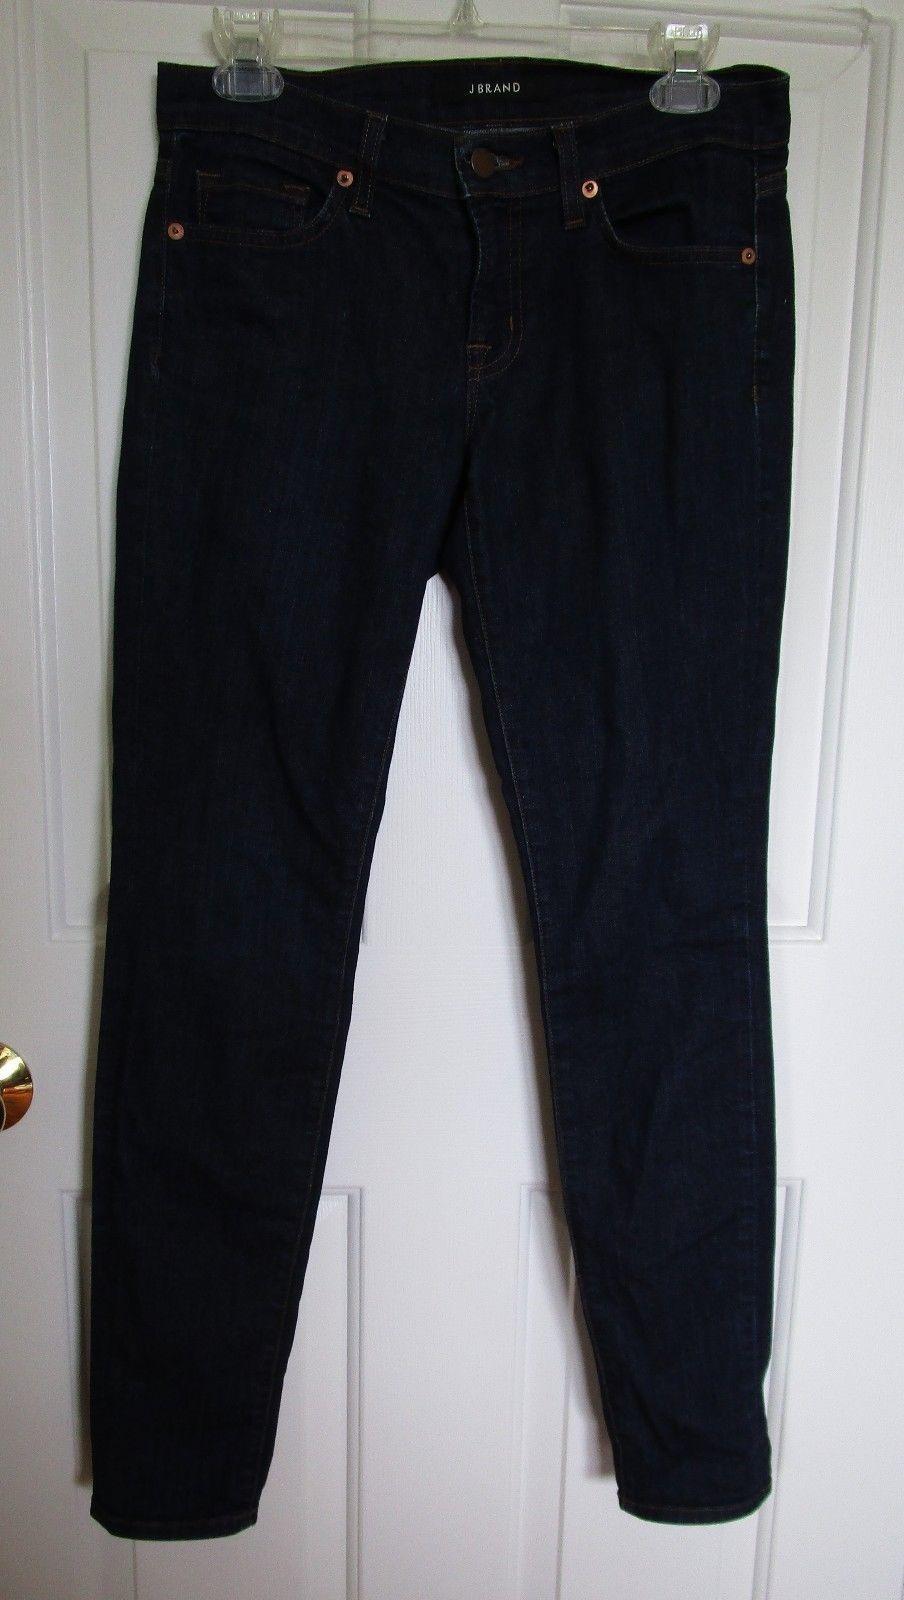 "J BRAND Women's Dark Denim Skinny Leg ""Pure"" 5 Pocket Jean Size 27"